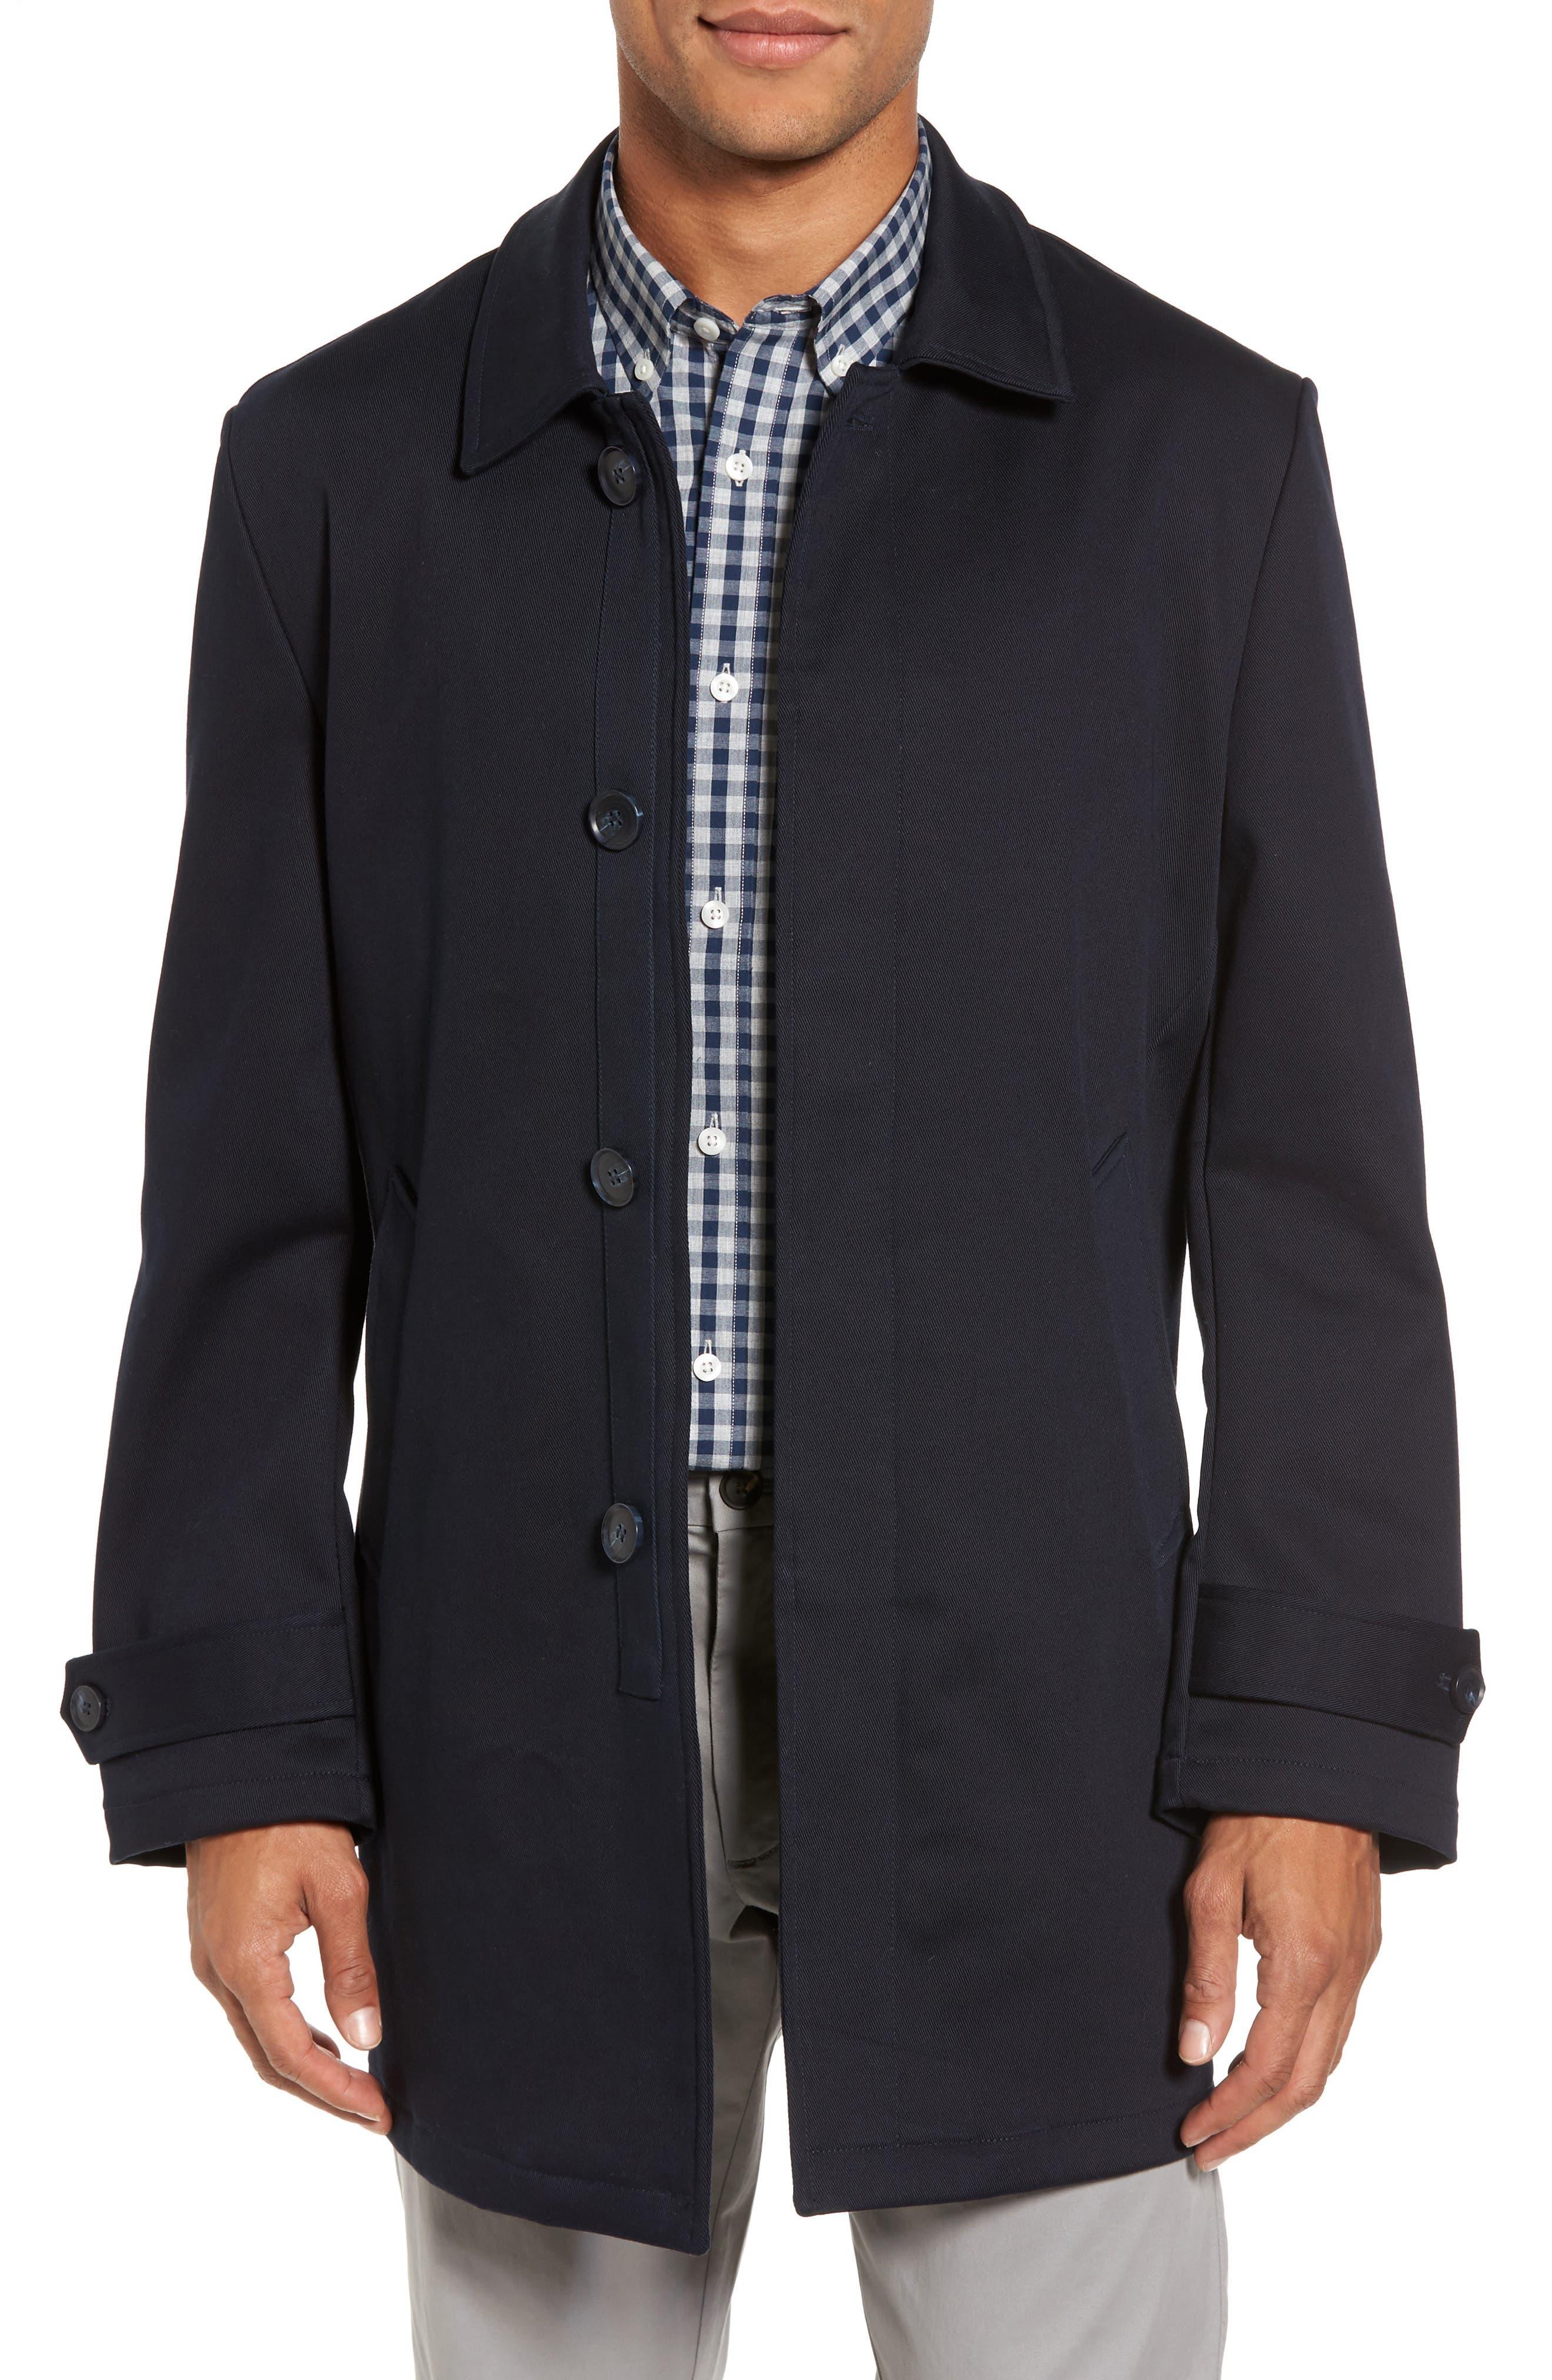 Alternate Image 1 Selected - Nordstrom Men's Shop Grayson Stretch Cotton Blend Car Coat